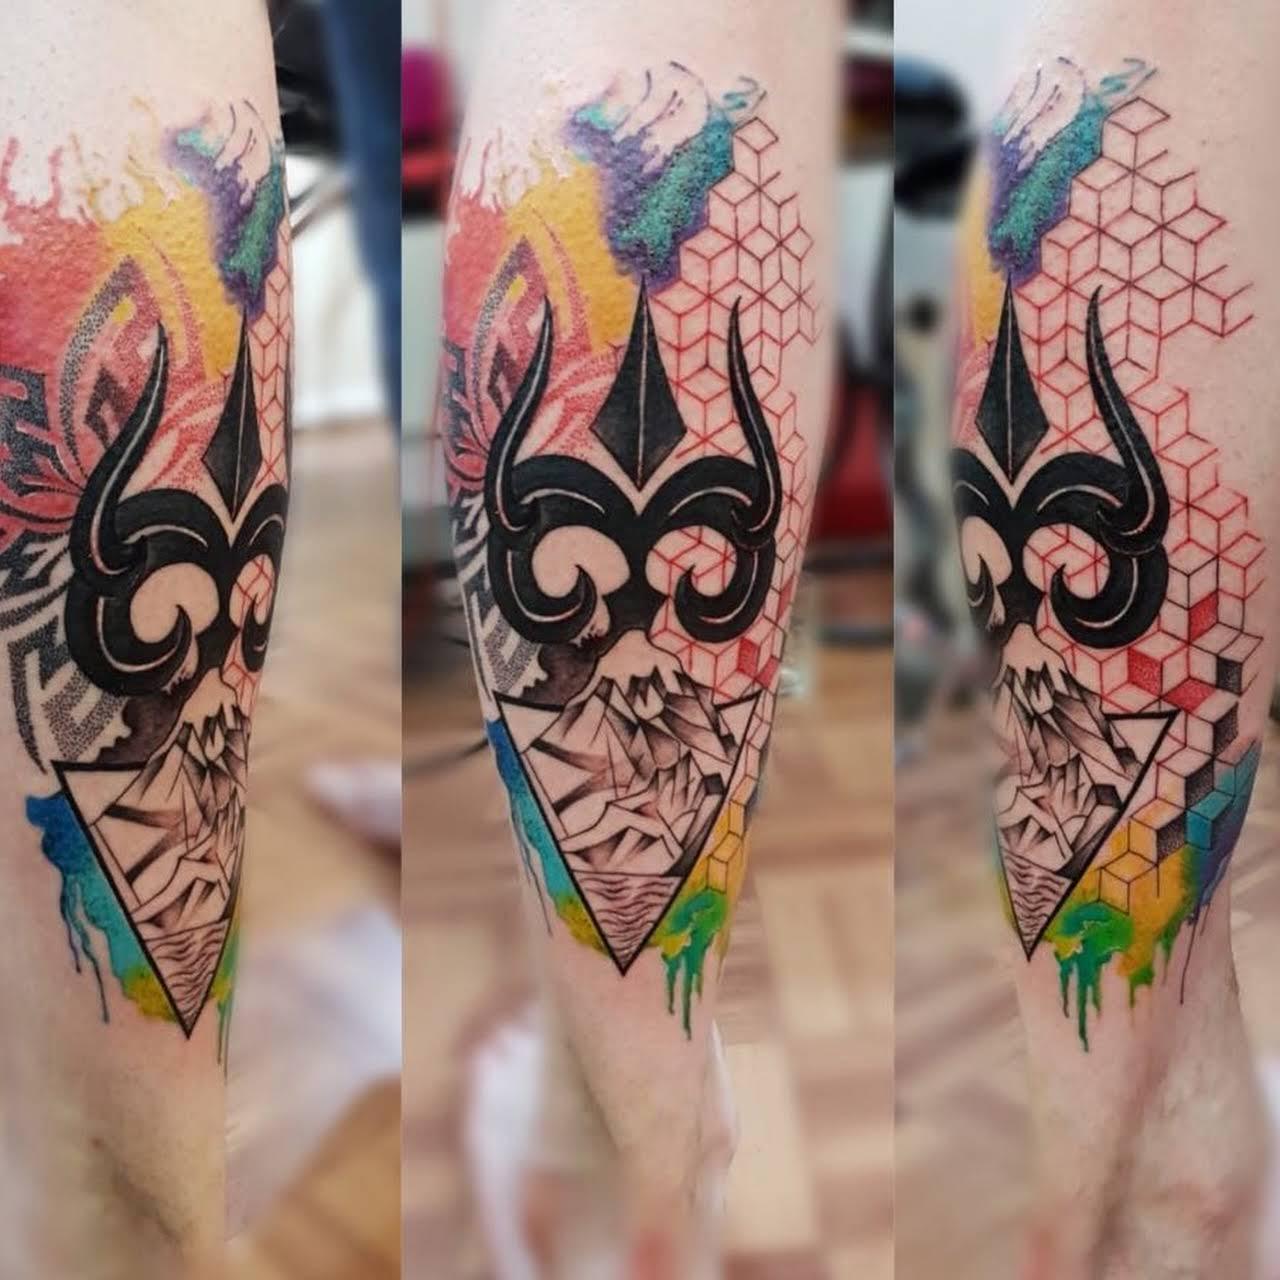 b5c07c85b Buddha Tattoo Studio in Hyderabad - Tattoo Shop in Hyderabad